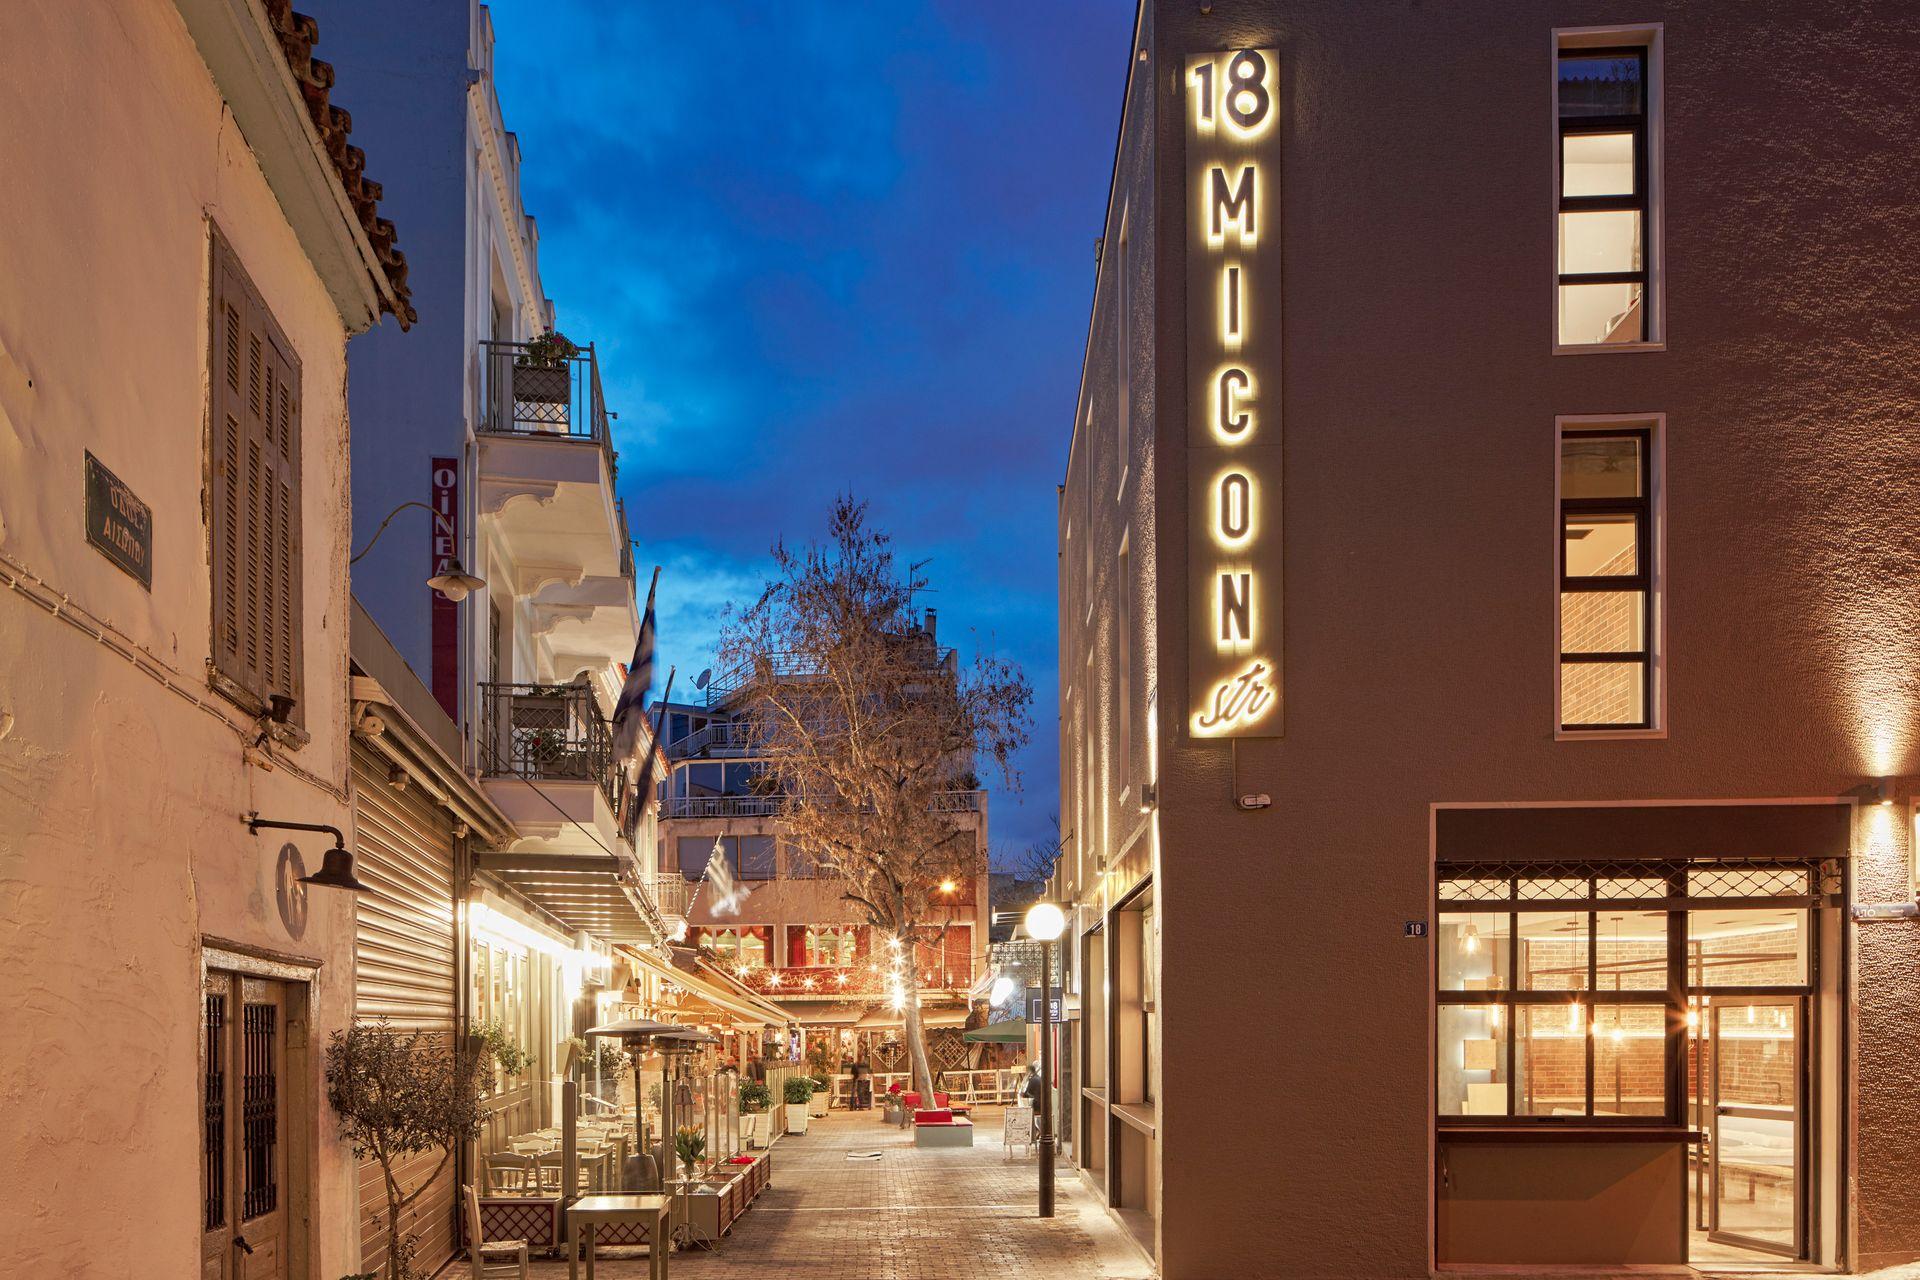 18 Micon Street Hotel, Athens, Greece